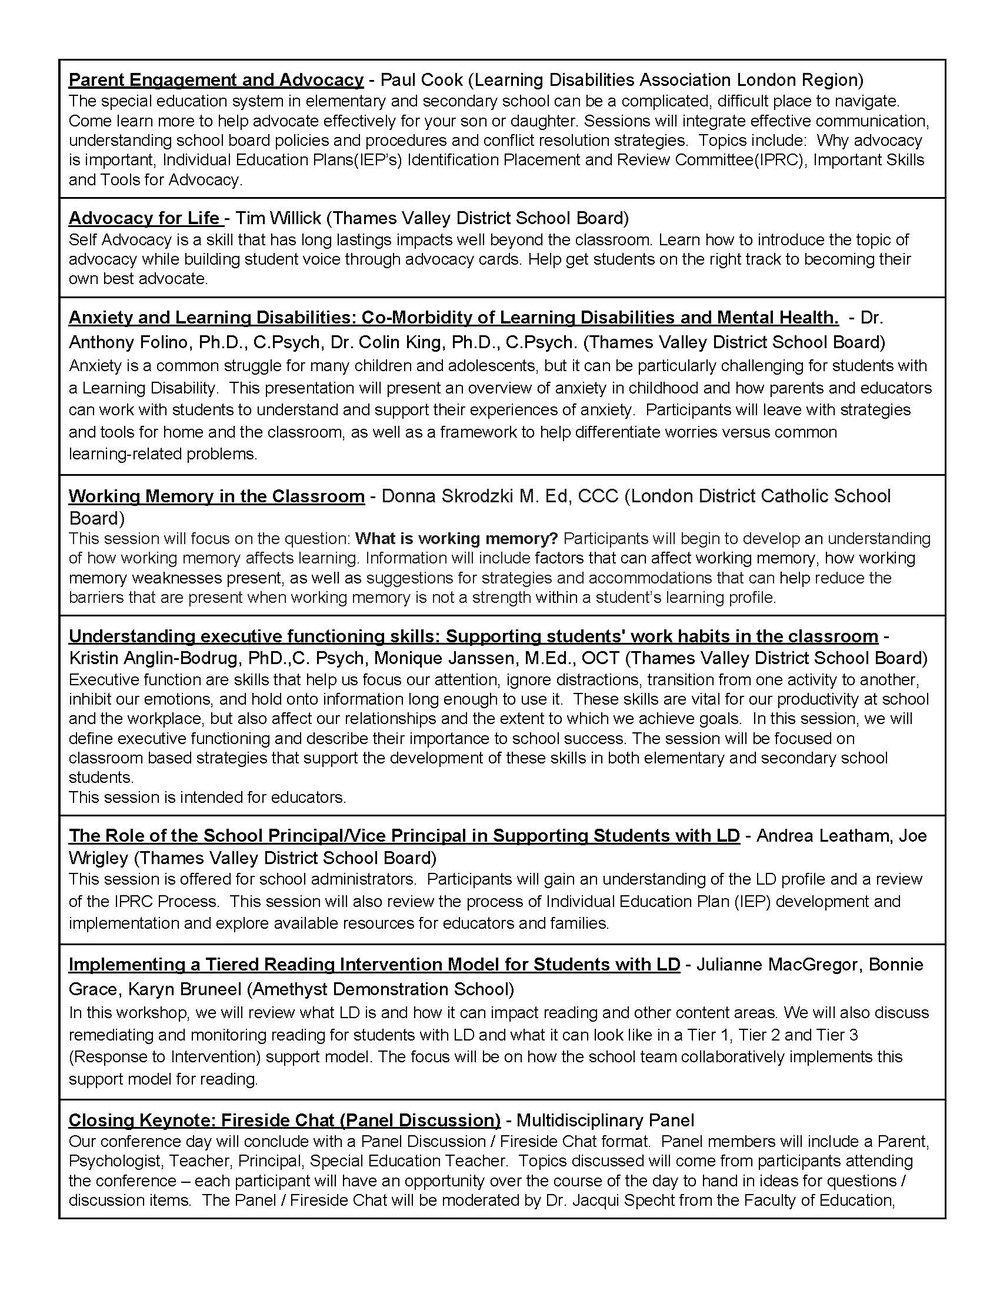 LondonRegionLearningDisabilitiesSymposiumworkshops_Page_2.jpg